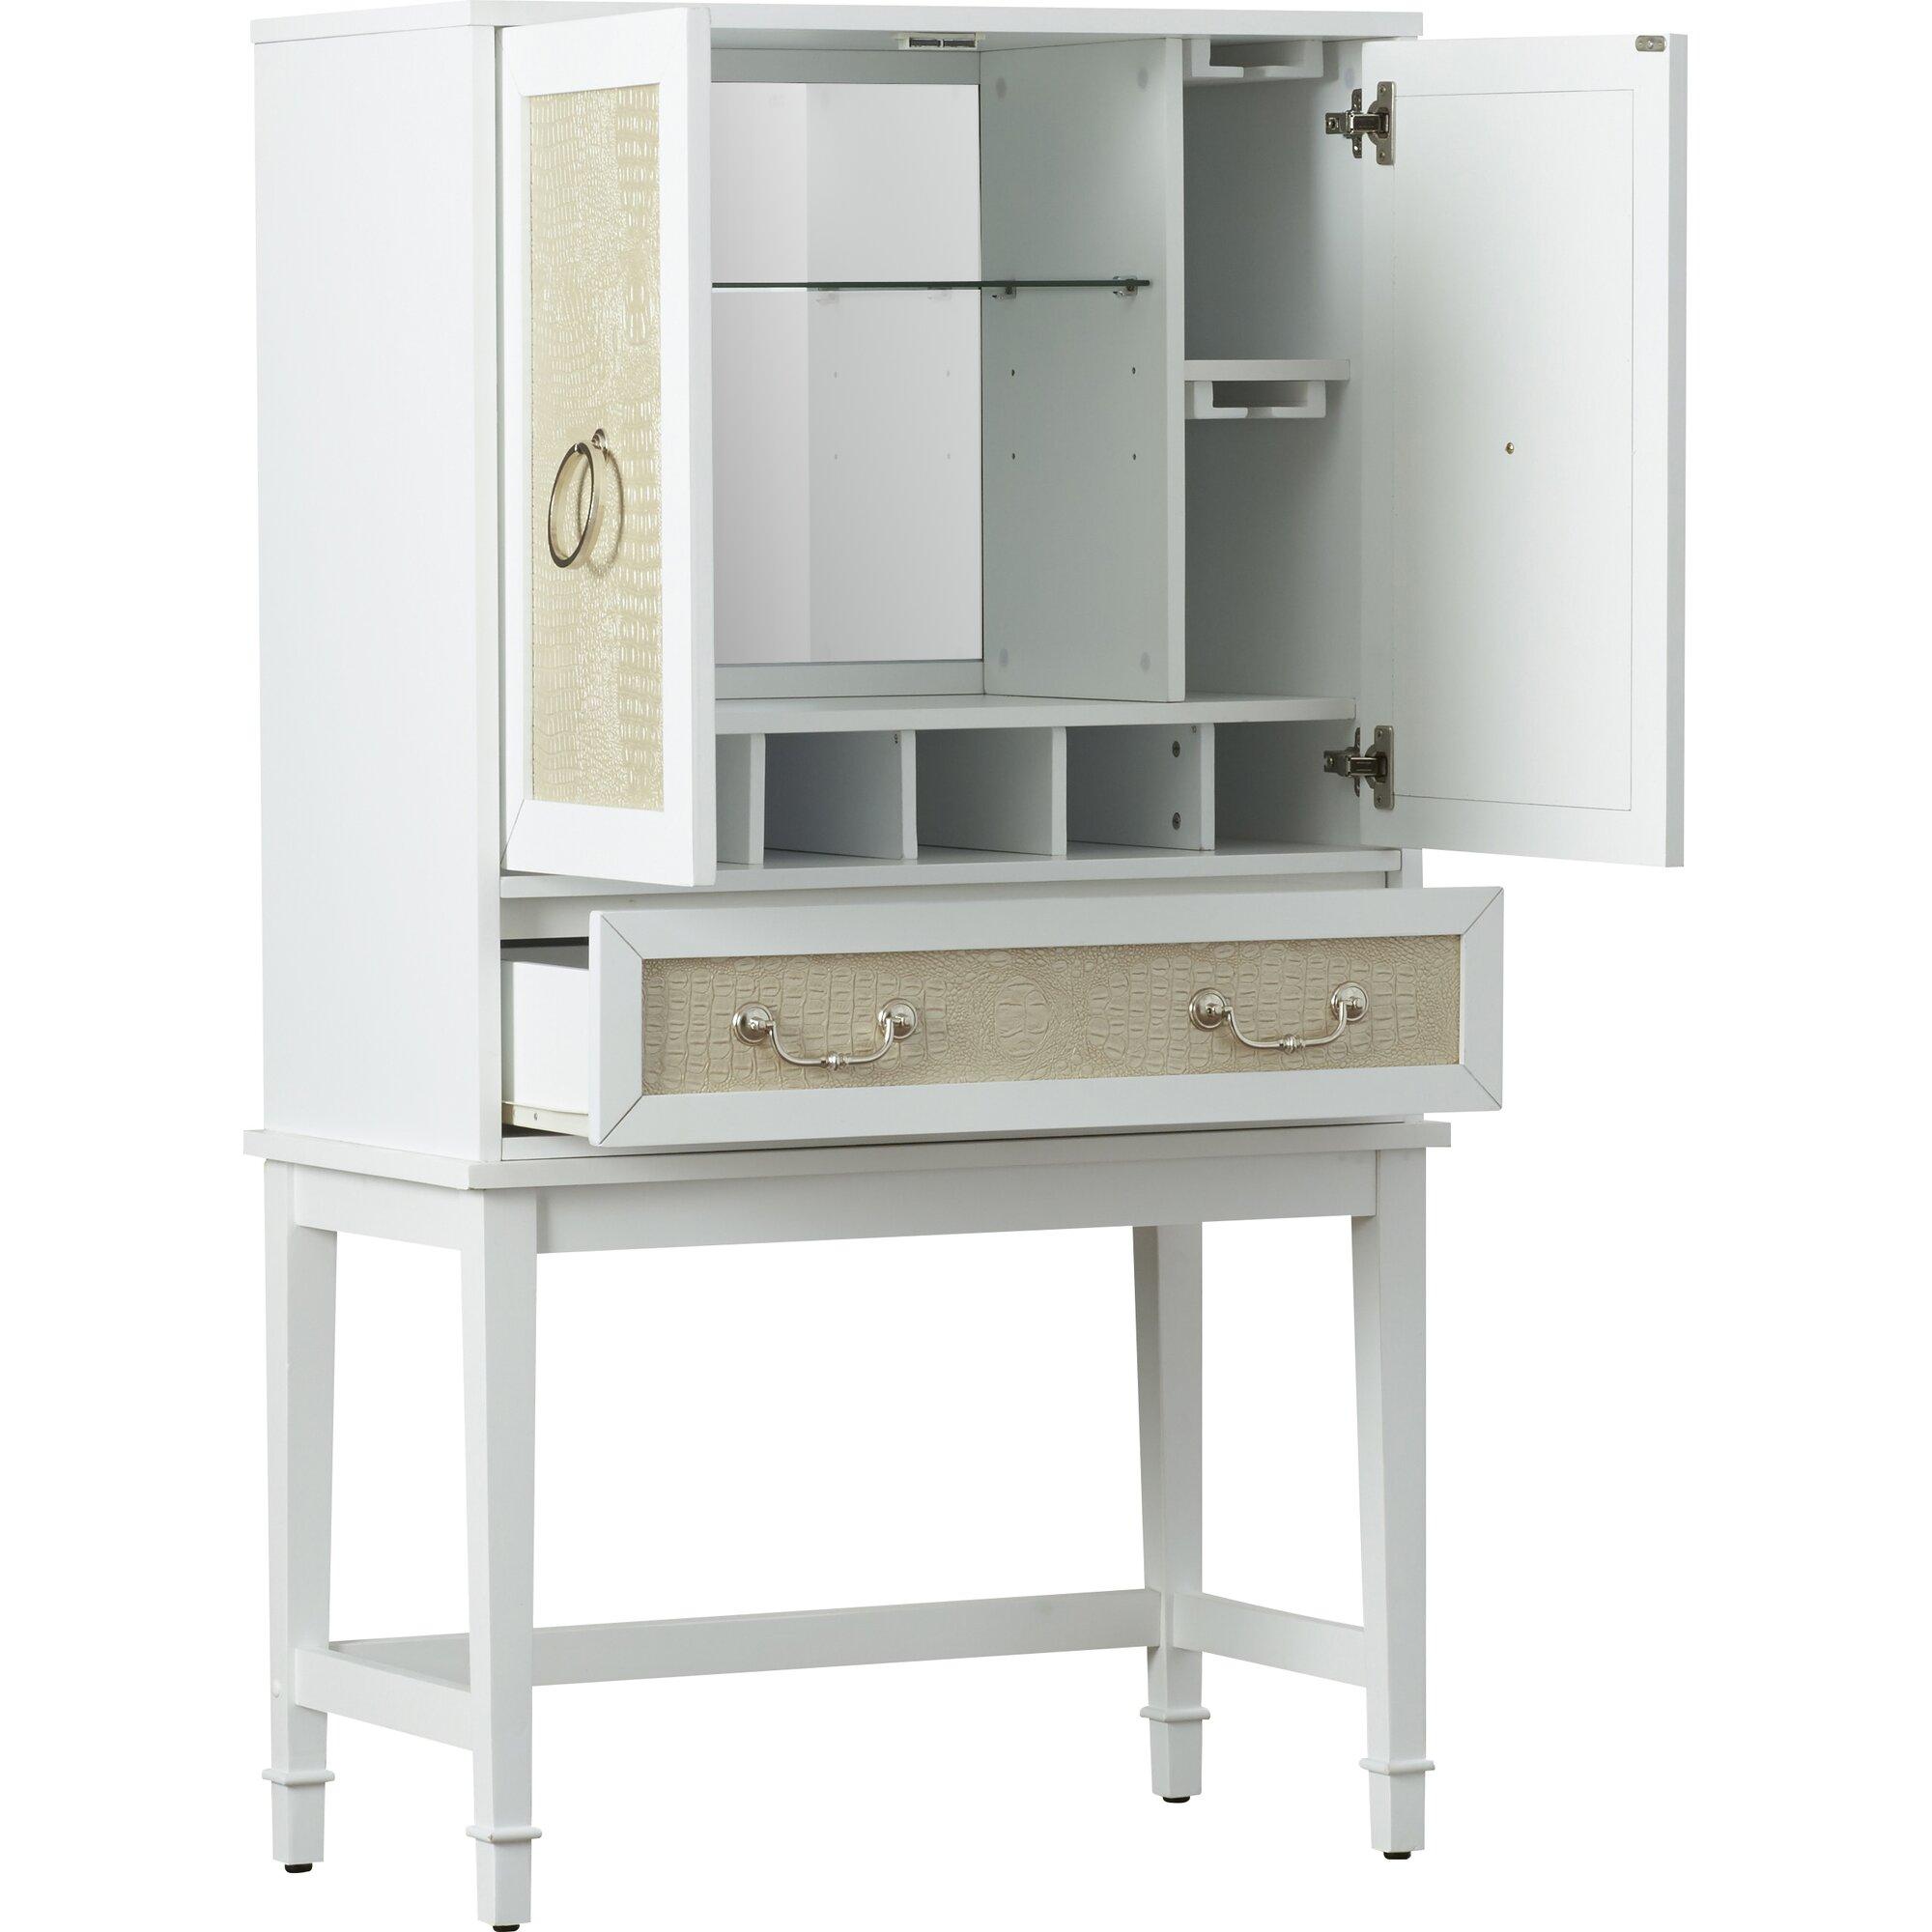 Willa arlo interiors lamphere bar cabinet with wine - Willa arlo interiors keeley bar cart ...